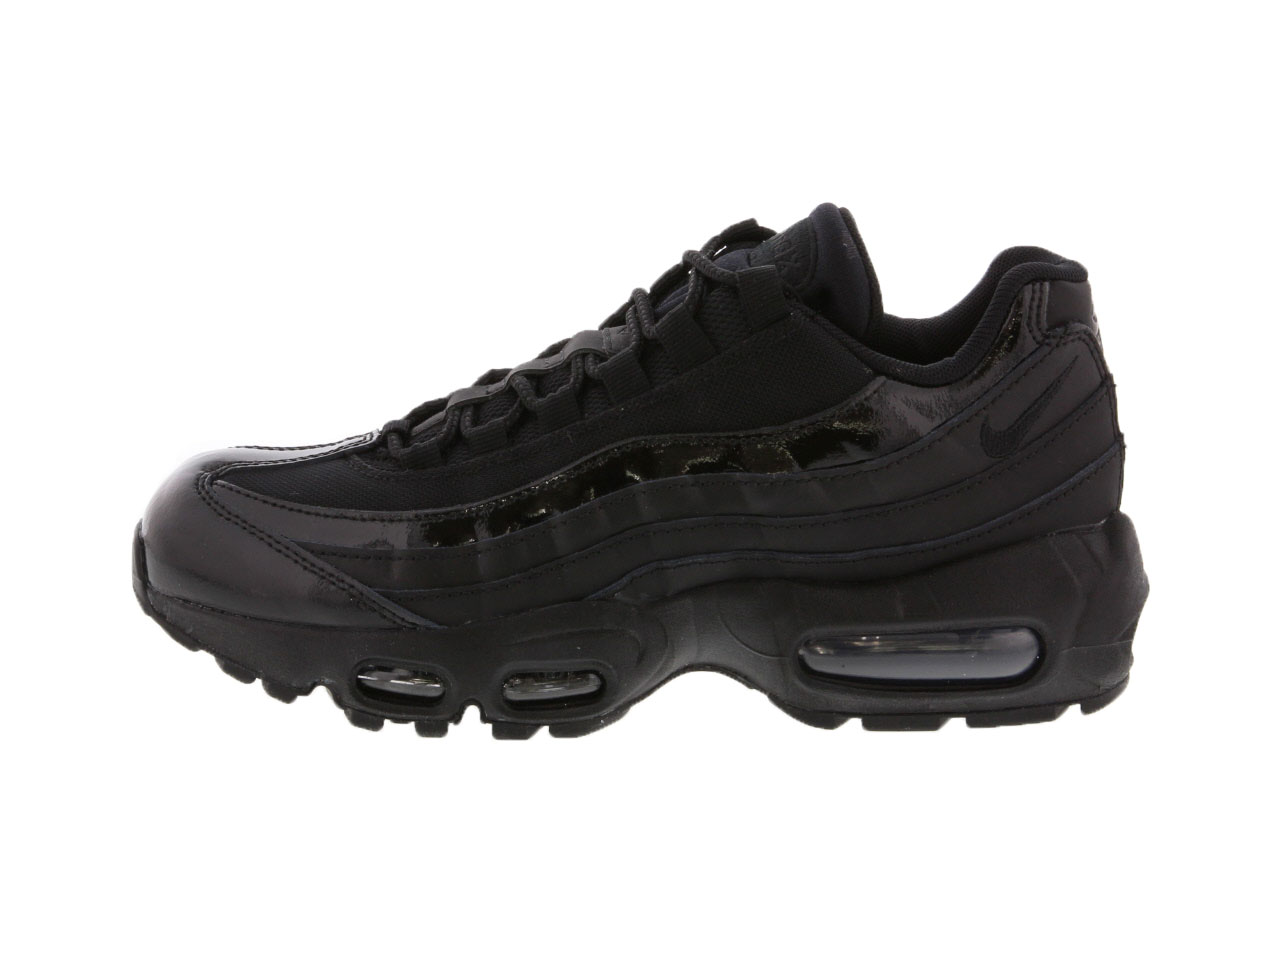 NIKE WOMENS AIR MAX 95(307960-010)【ナイキ ウィメンズ エアマックス95】【レディースファッション】【シューズ】【靴】【スニーカー】【フットウェア】